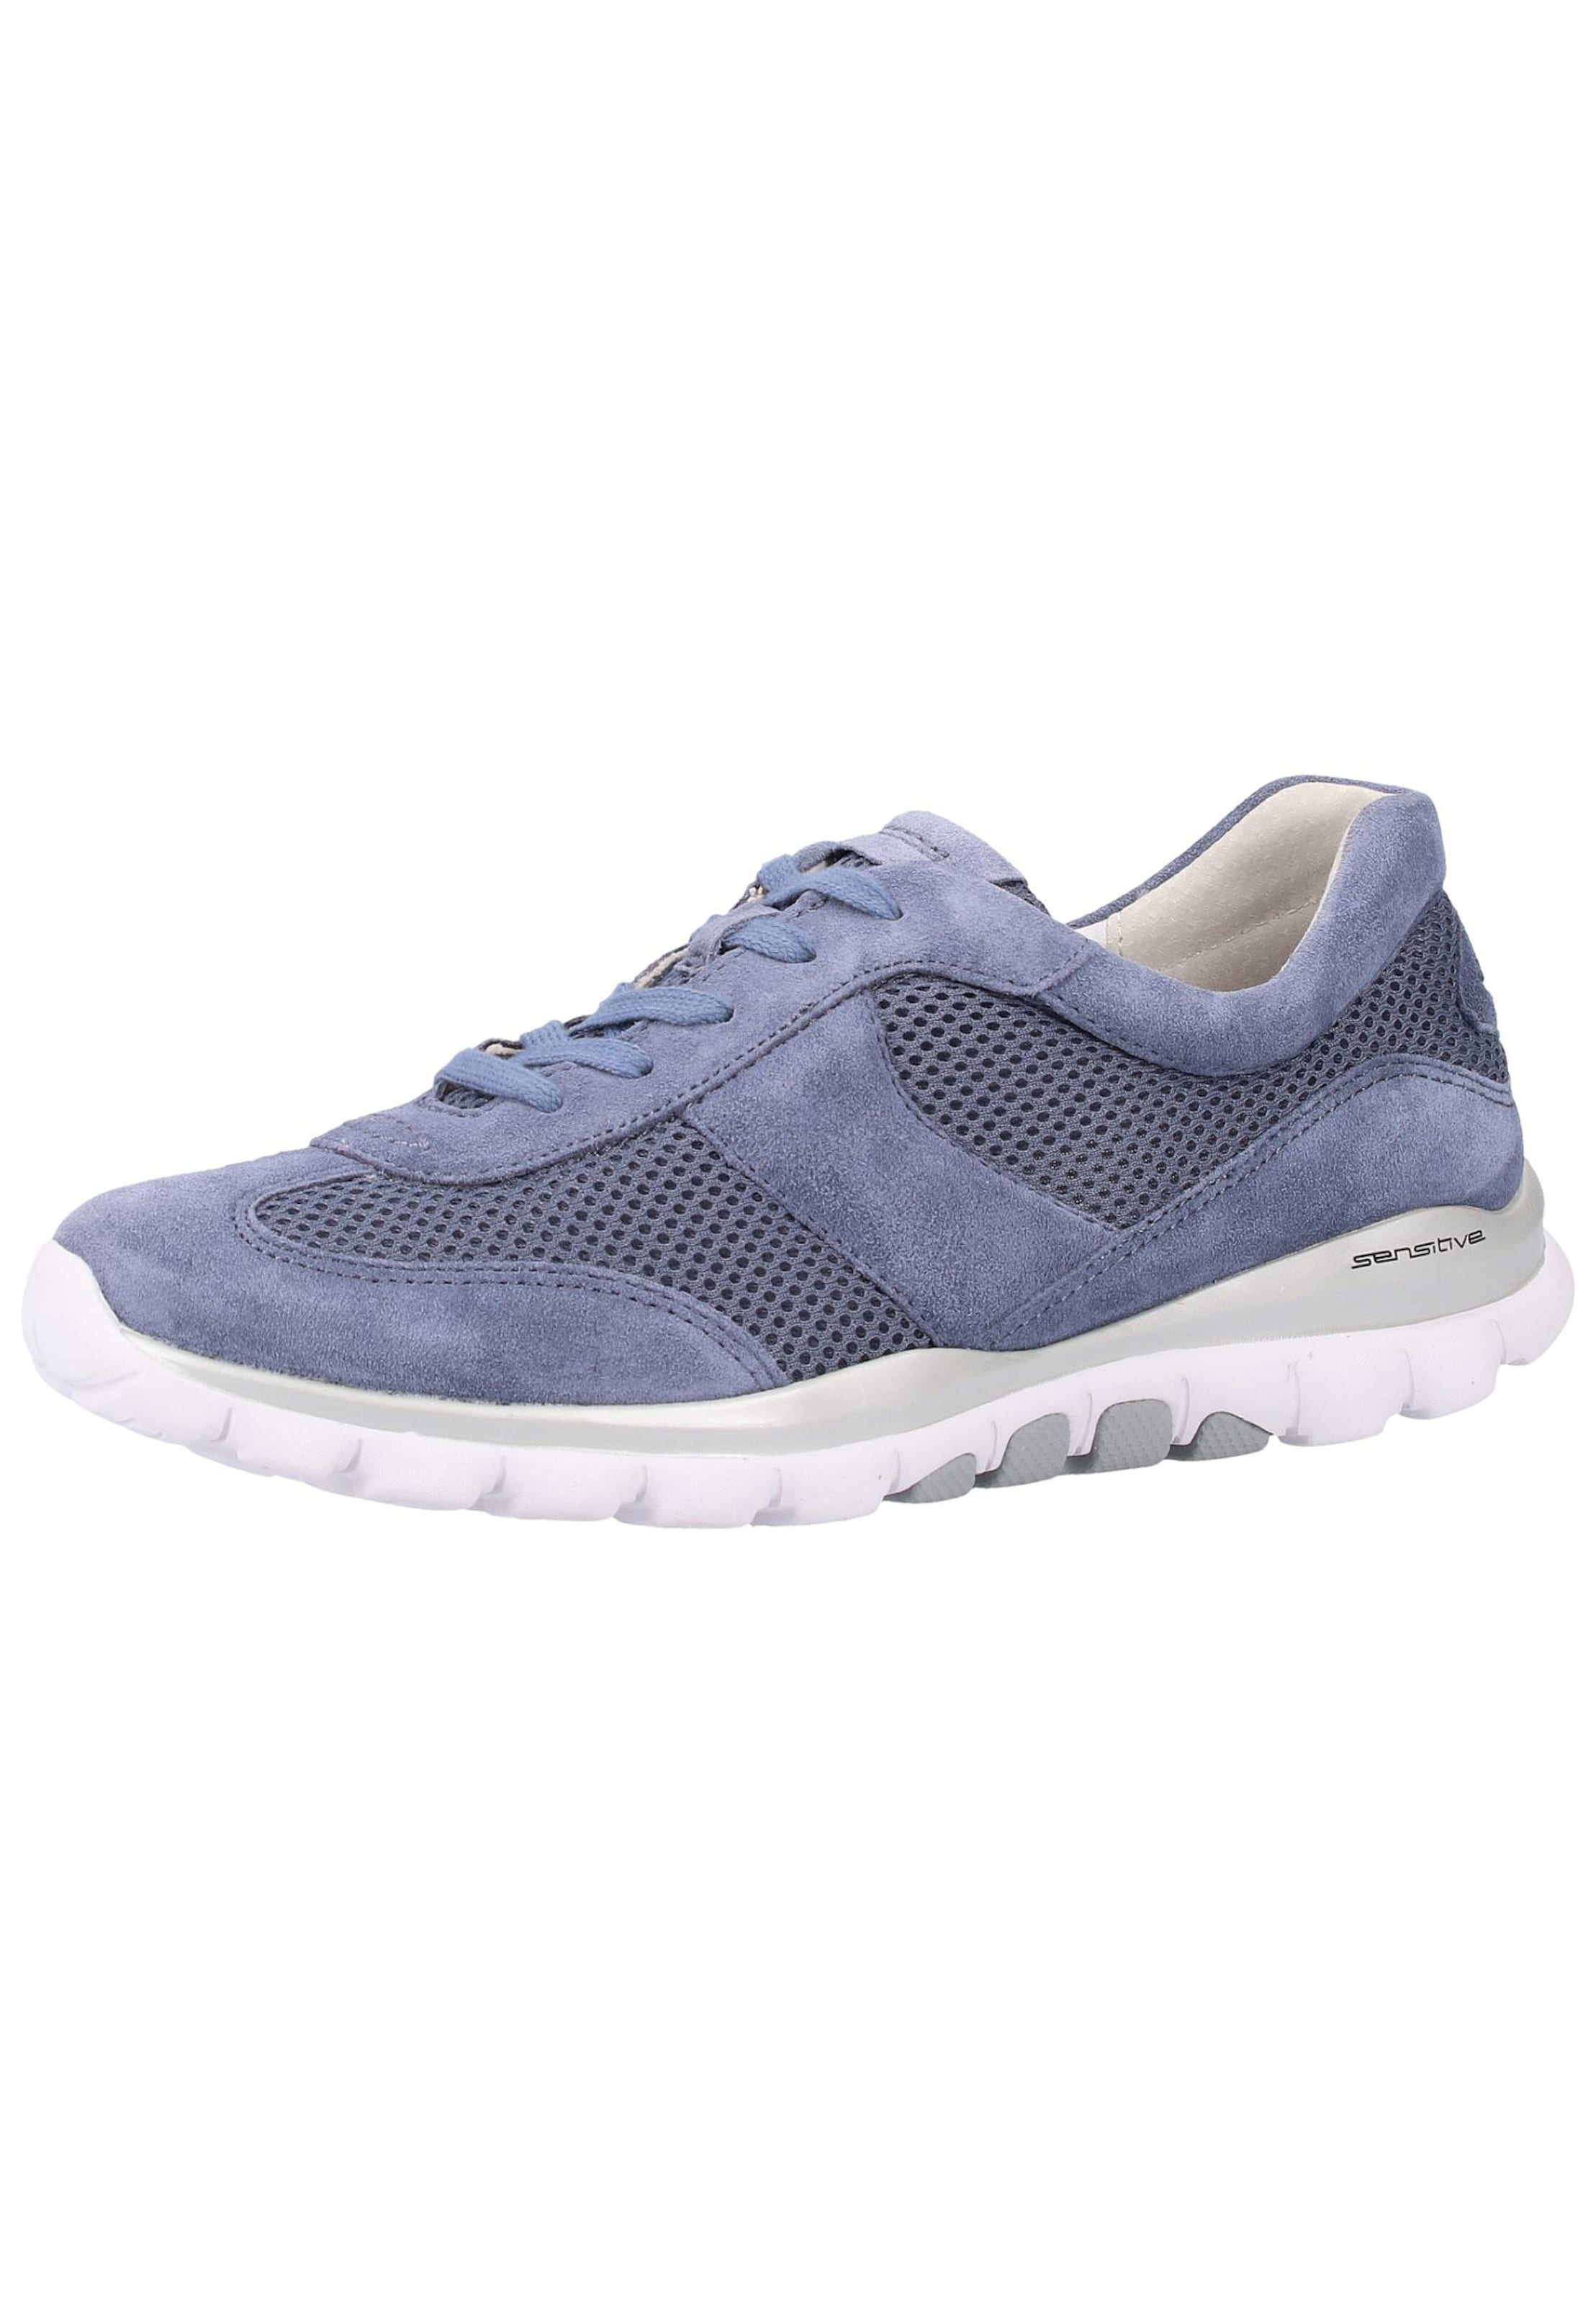 In Sneaker Gabor Gabor Violettblau Violettblau Sneaker In Gabor uXPOkZiT